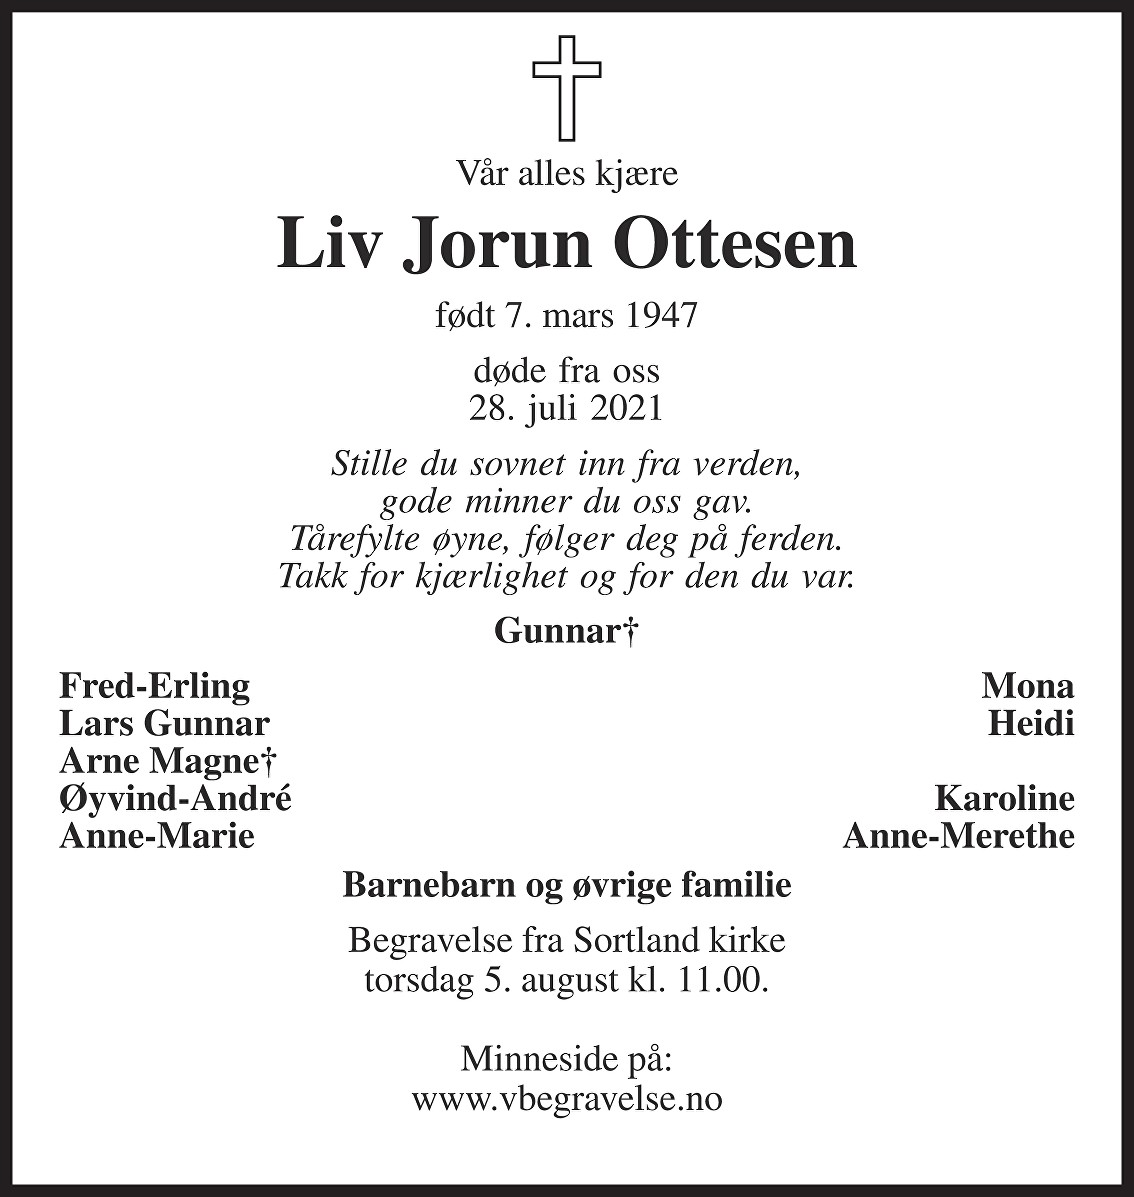 Liv Jorun Ottesen Dødsannonse